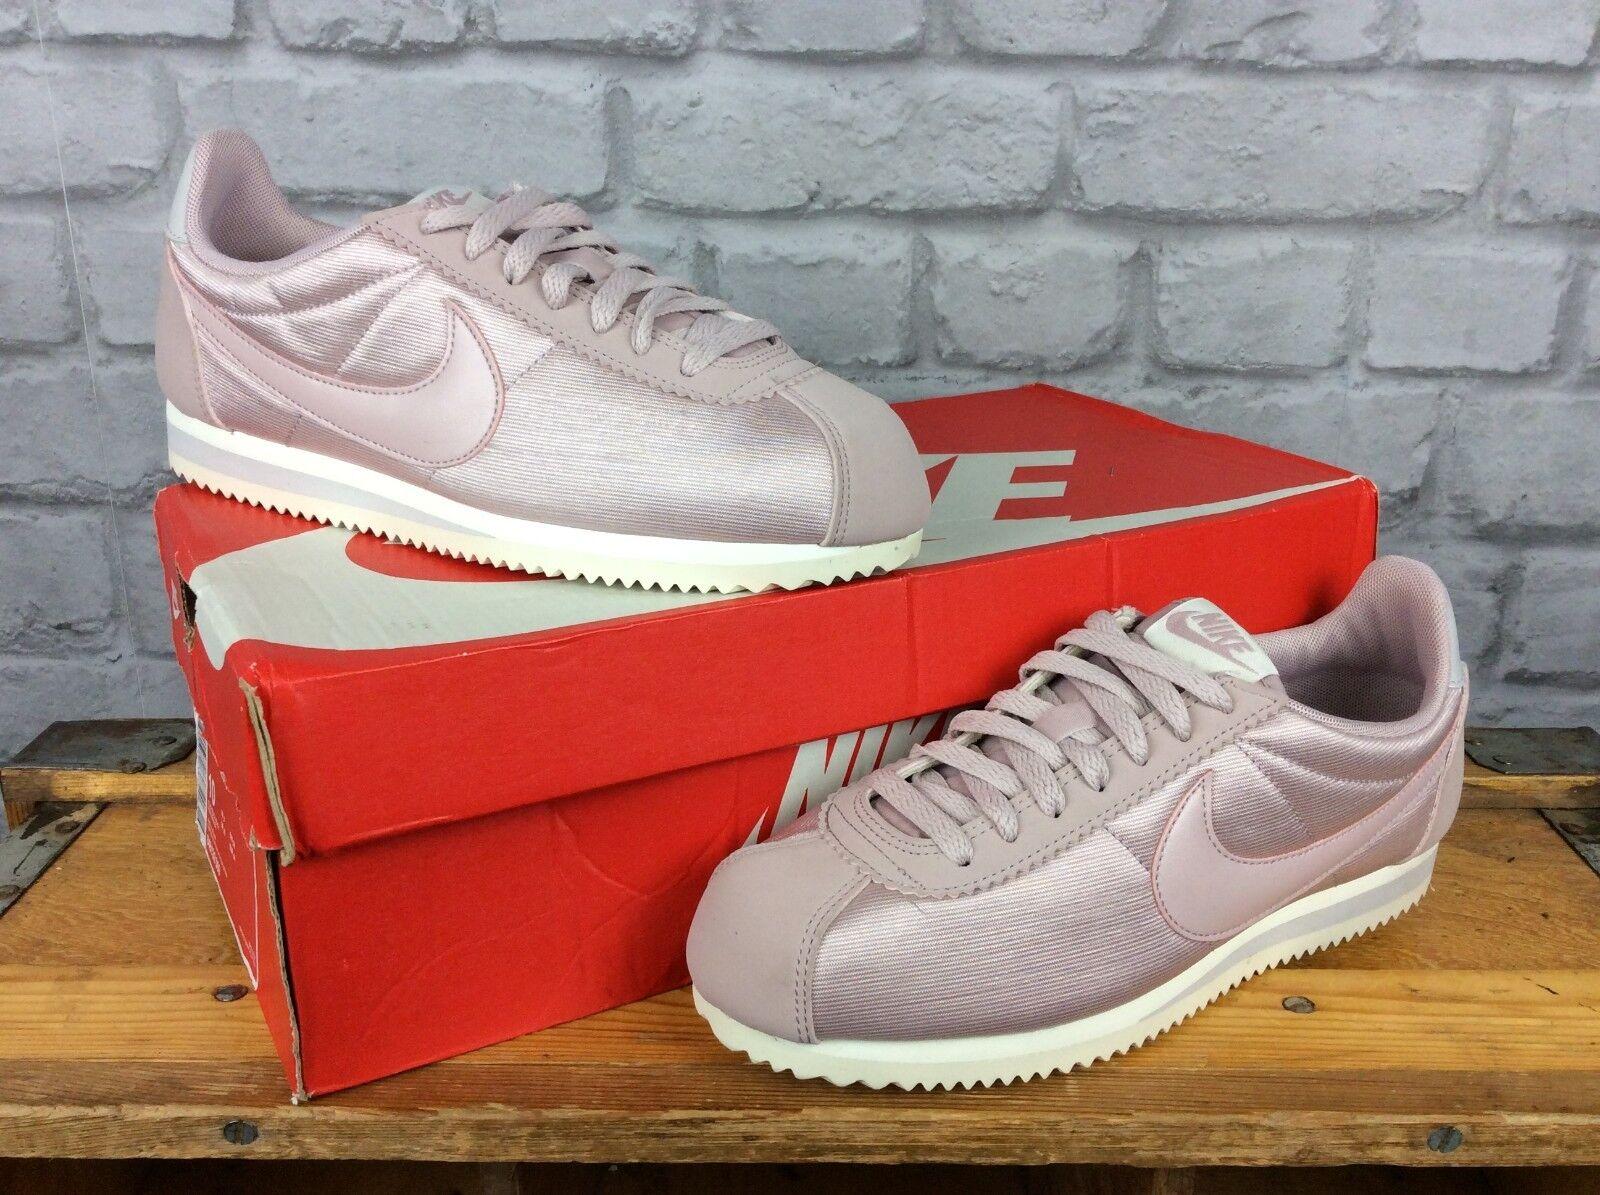 quality design 6c28e 30026 Nike Damas bastante Primrose Rosa Clásico Nylon Cortez se entrenadores